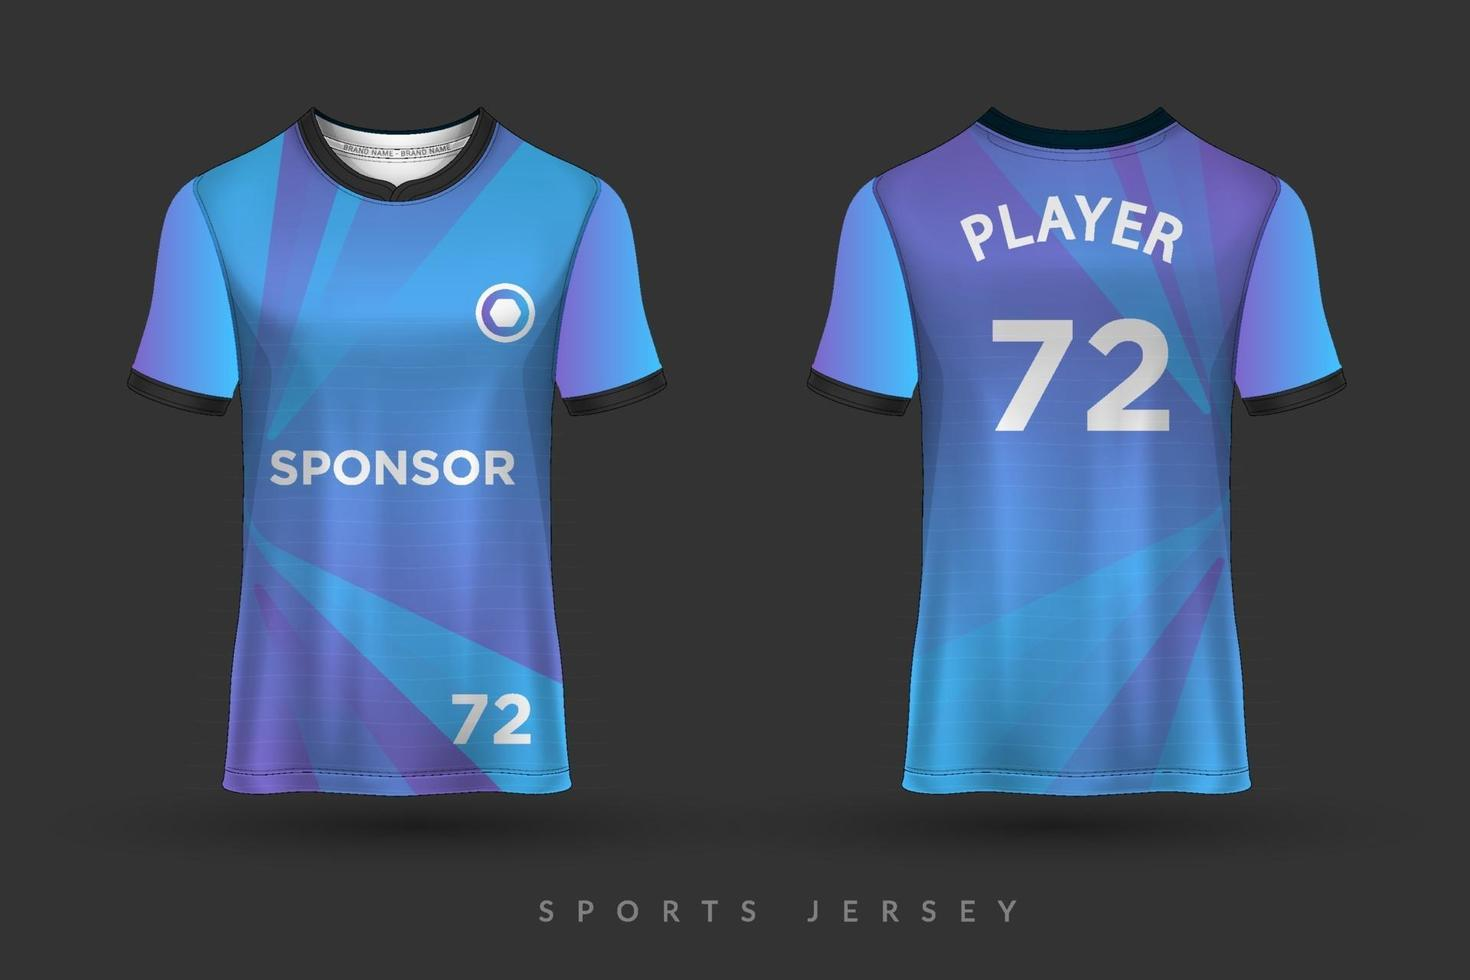 mockup uniformes futebol mockup para photoshop (cód. Soccer Jersey And Tshirt Sport Mockup Template Graphic Design For Football Kit 2395103 Vector Art At Vecteezy